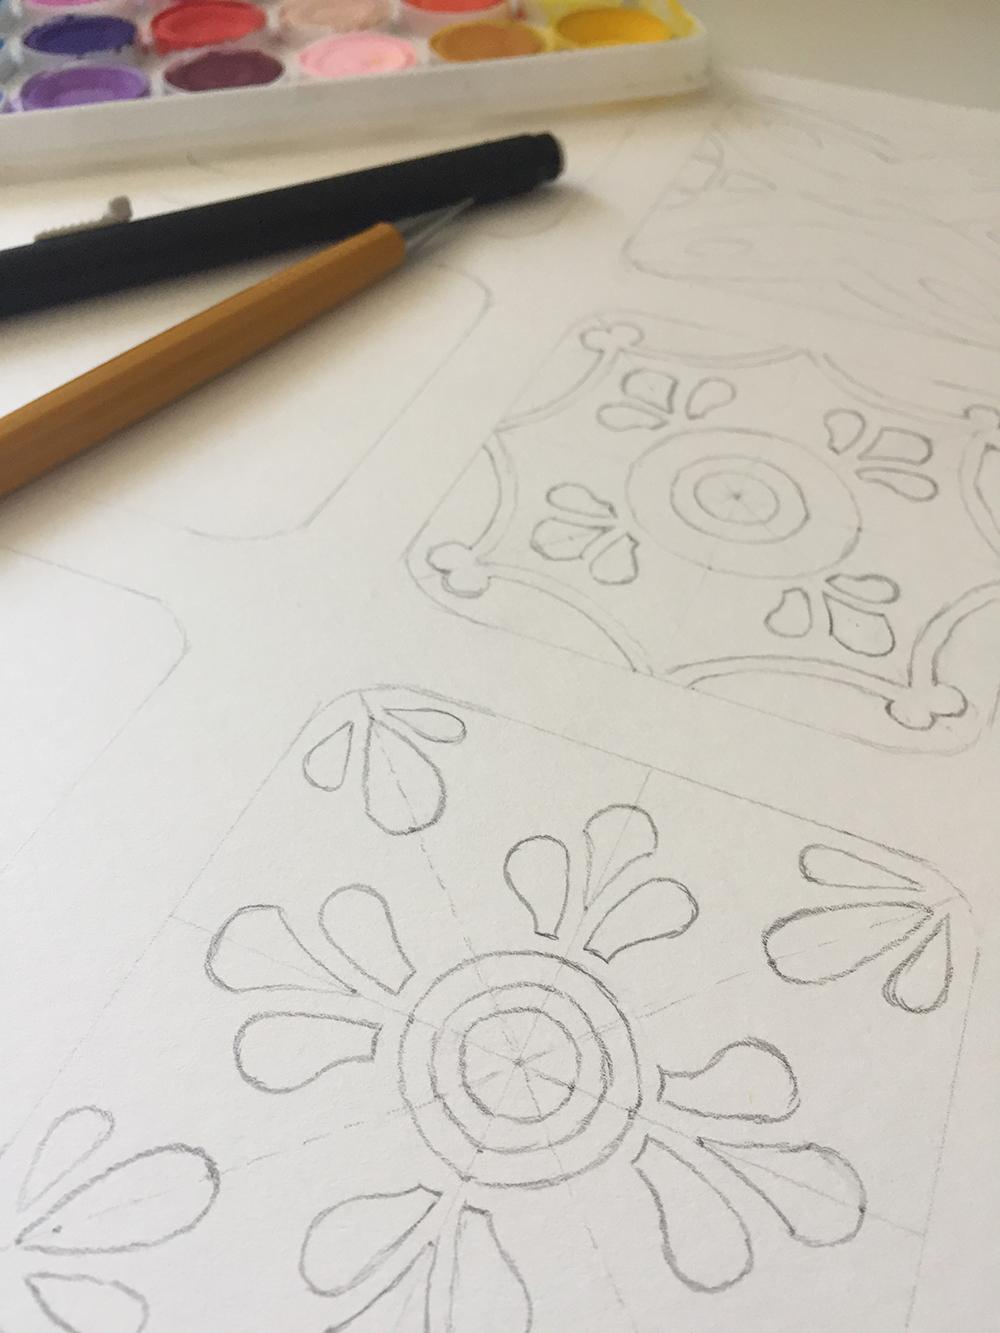 mexica-watercolor-tiles-pattern-06.JPG